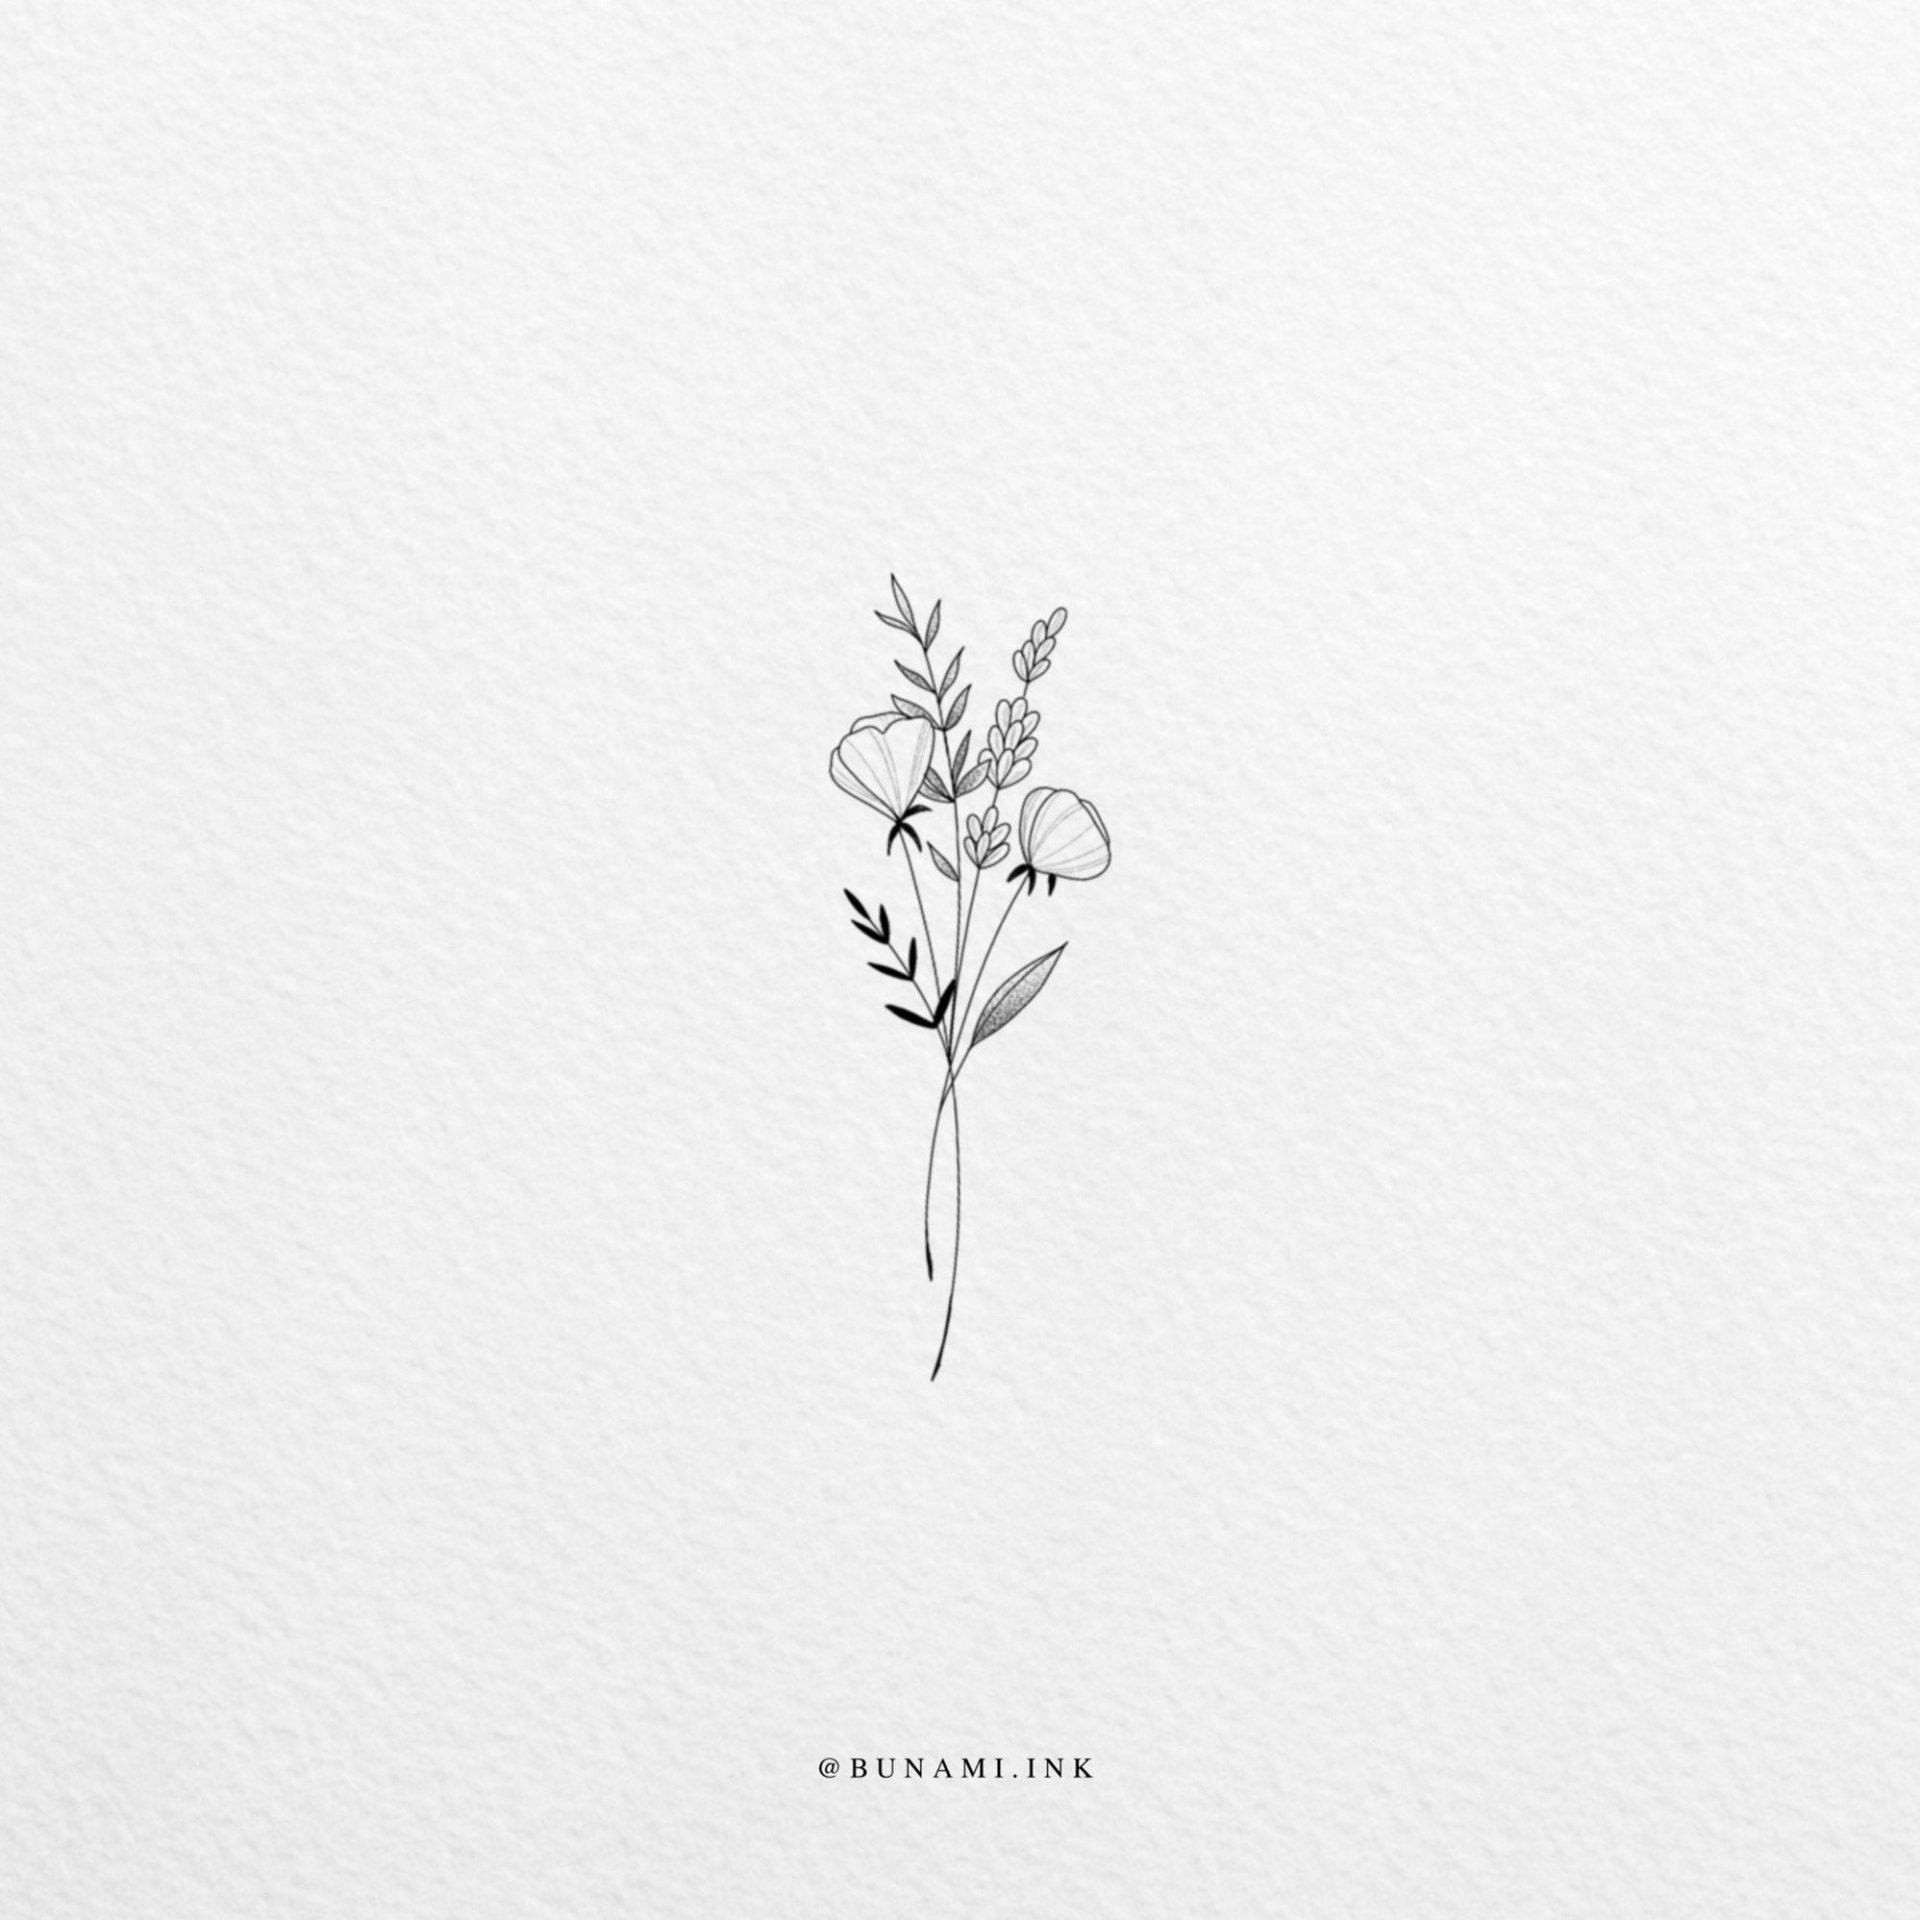 tiny-wild-lavender-bouquet-19-11-02